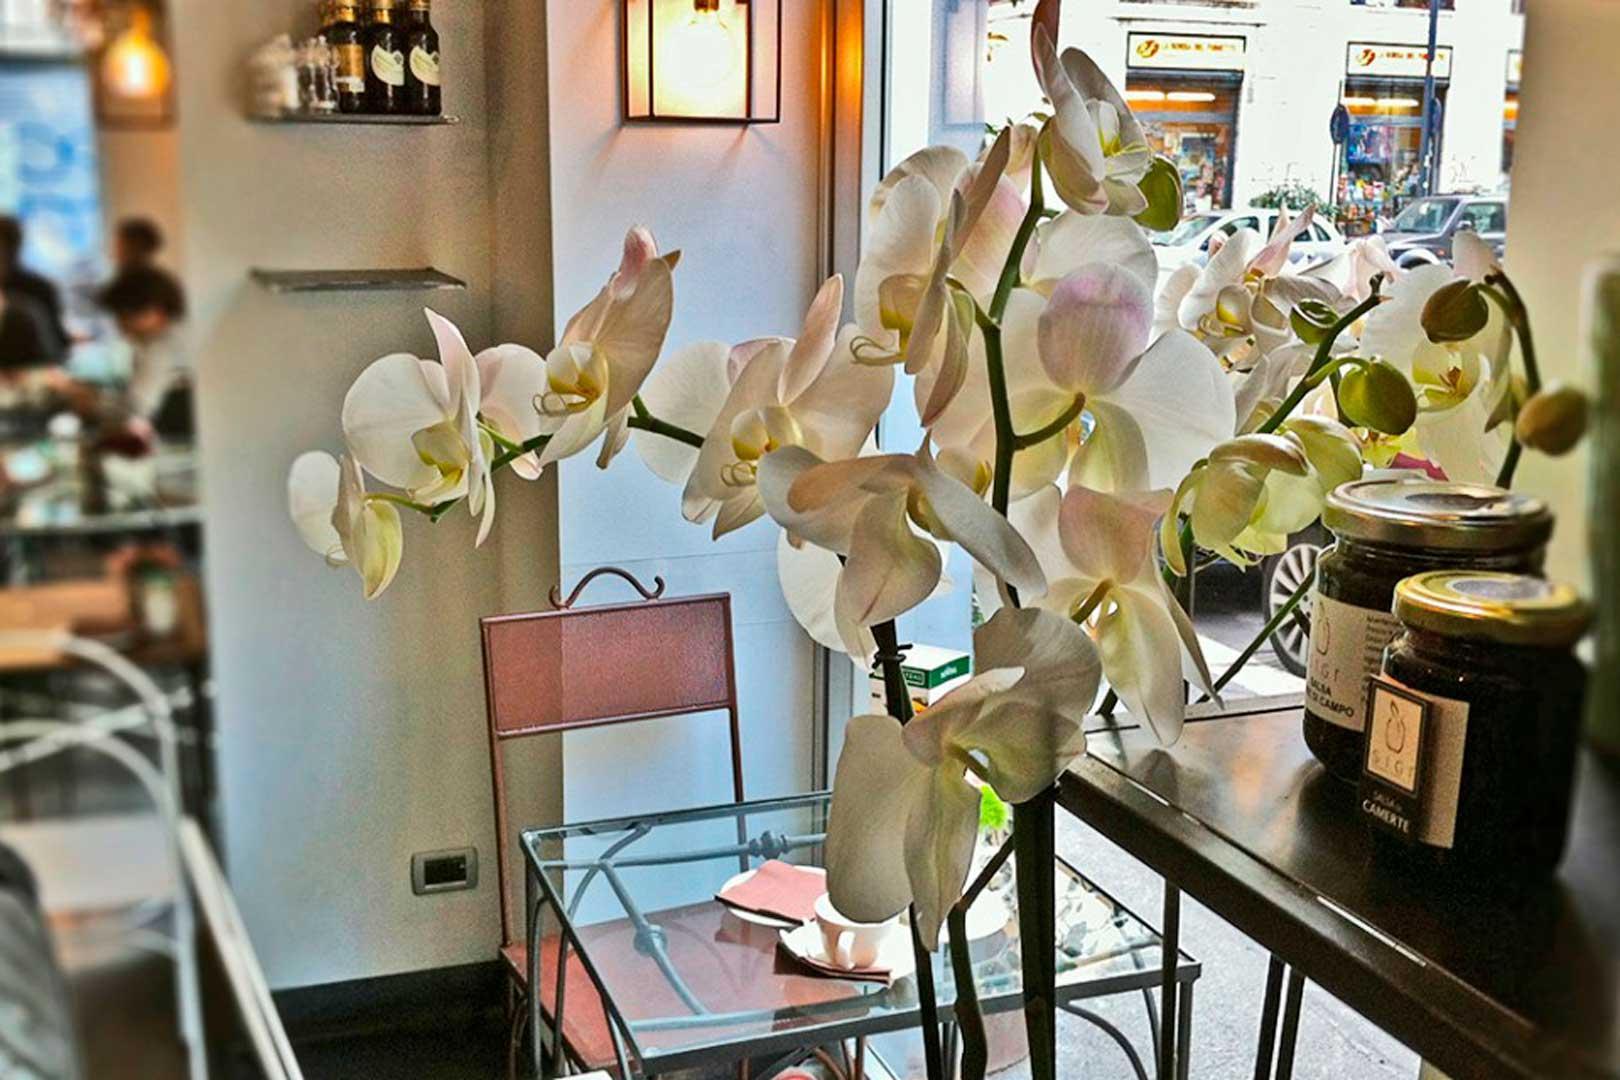 I migliori aperitivi di Porta Venezia - Mint Garden Cafe